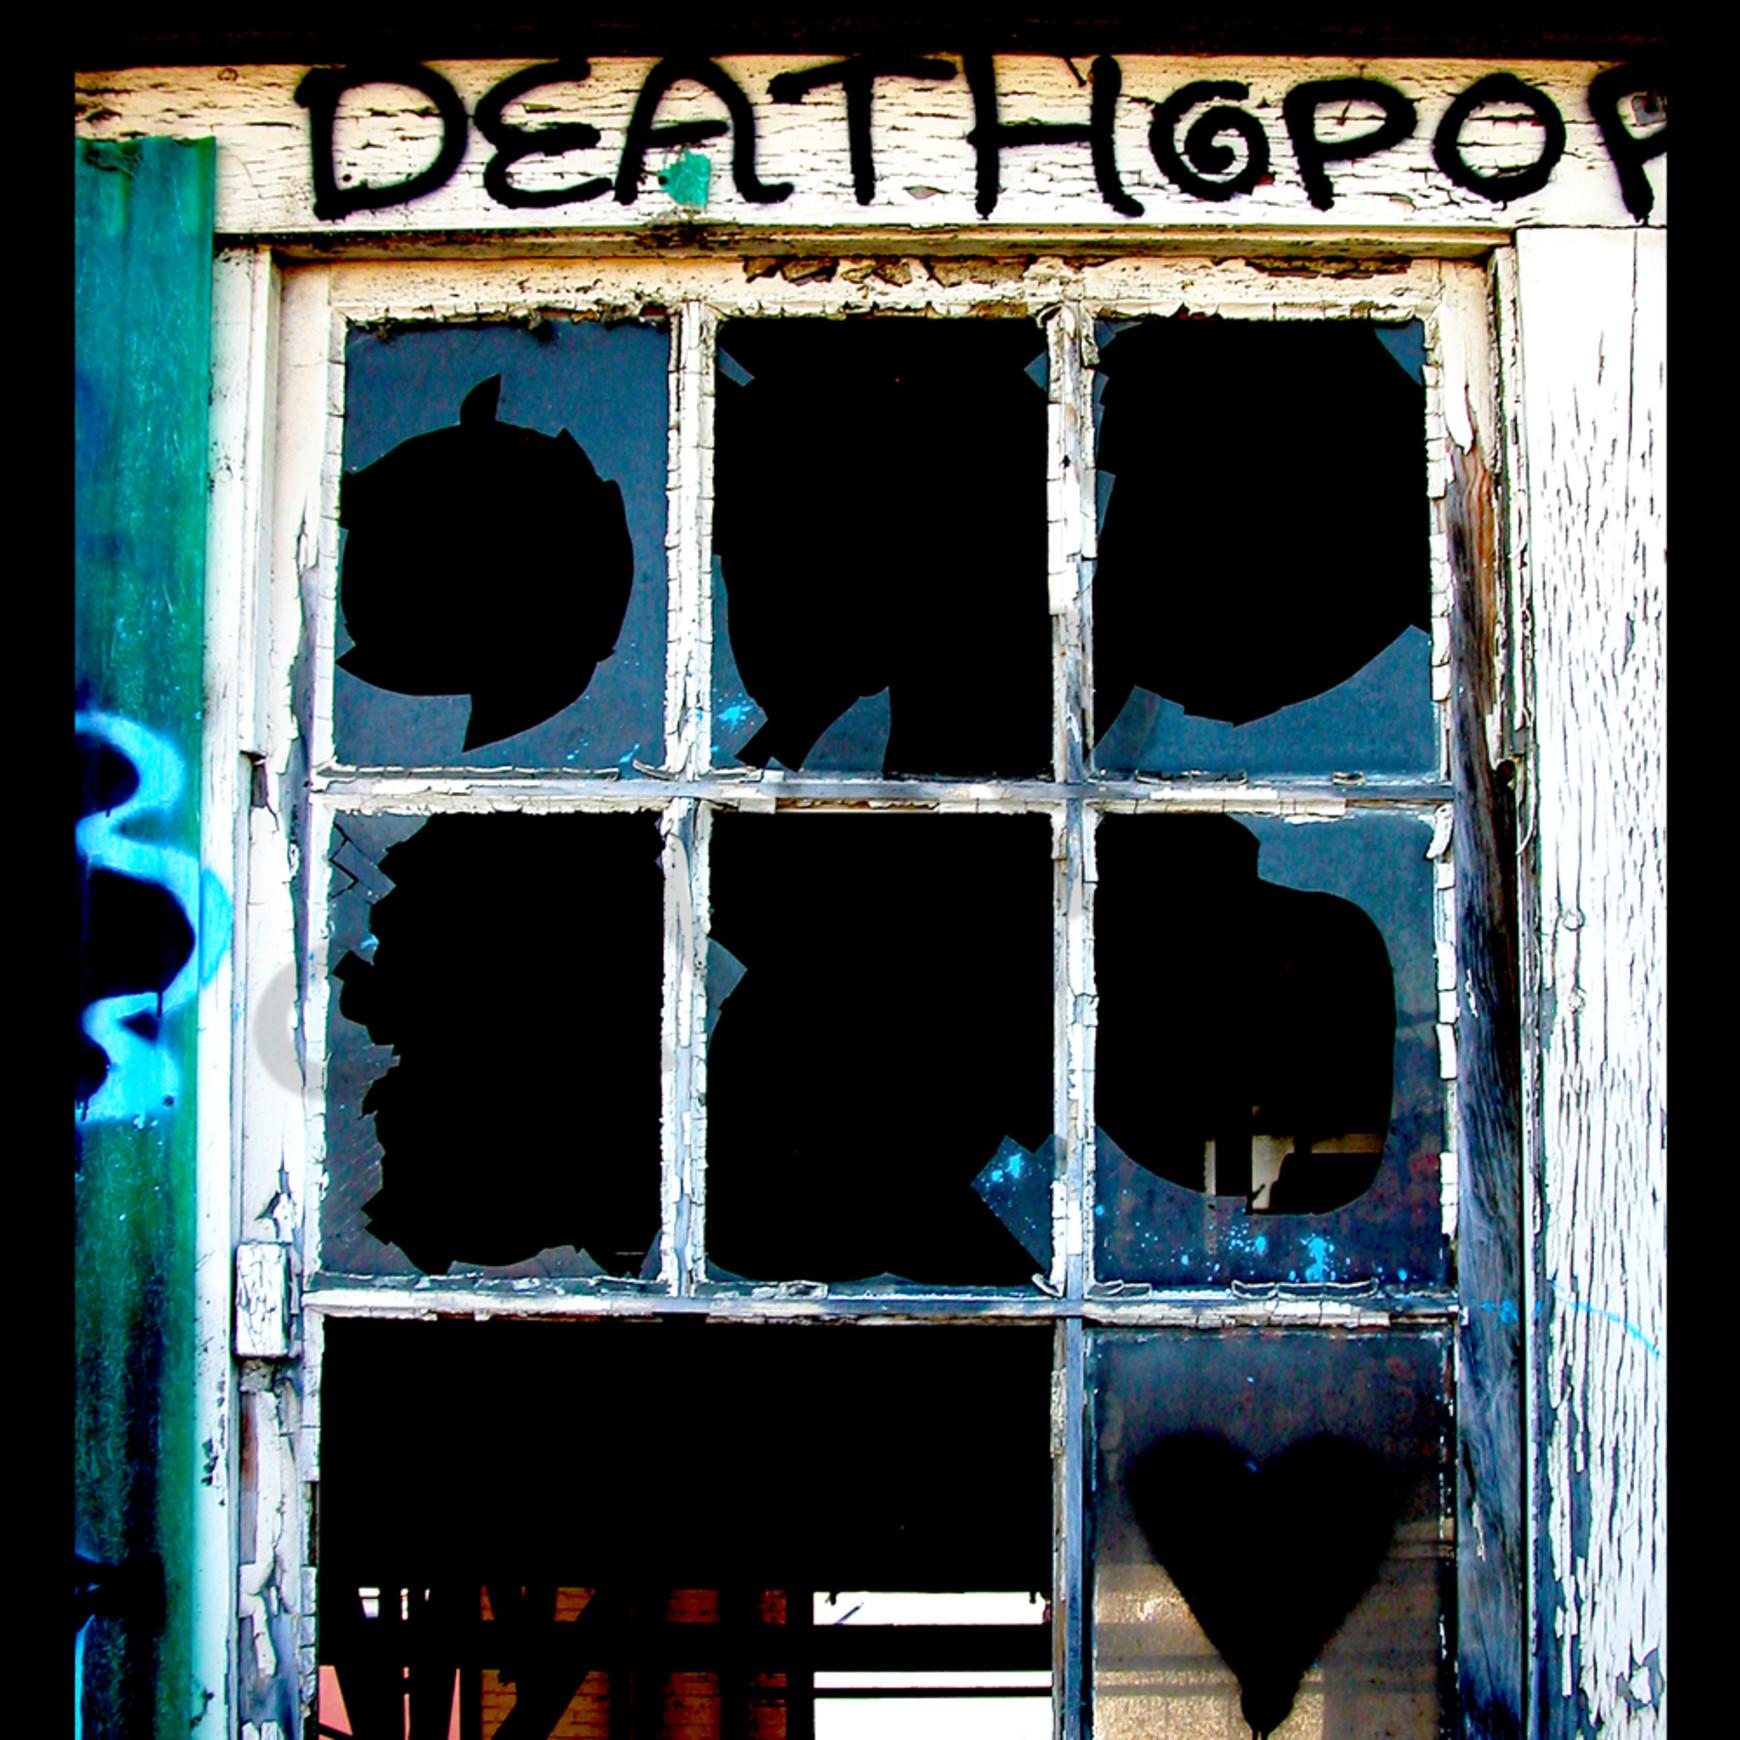 Death pop jltsta